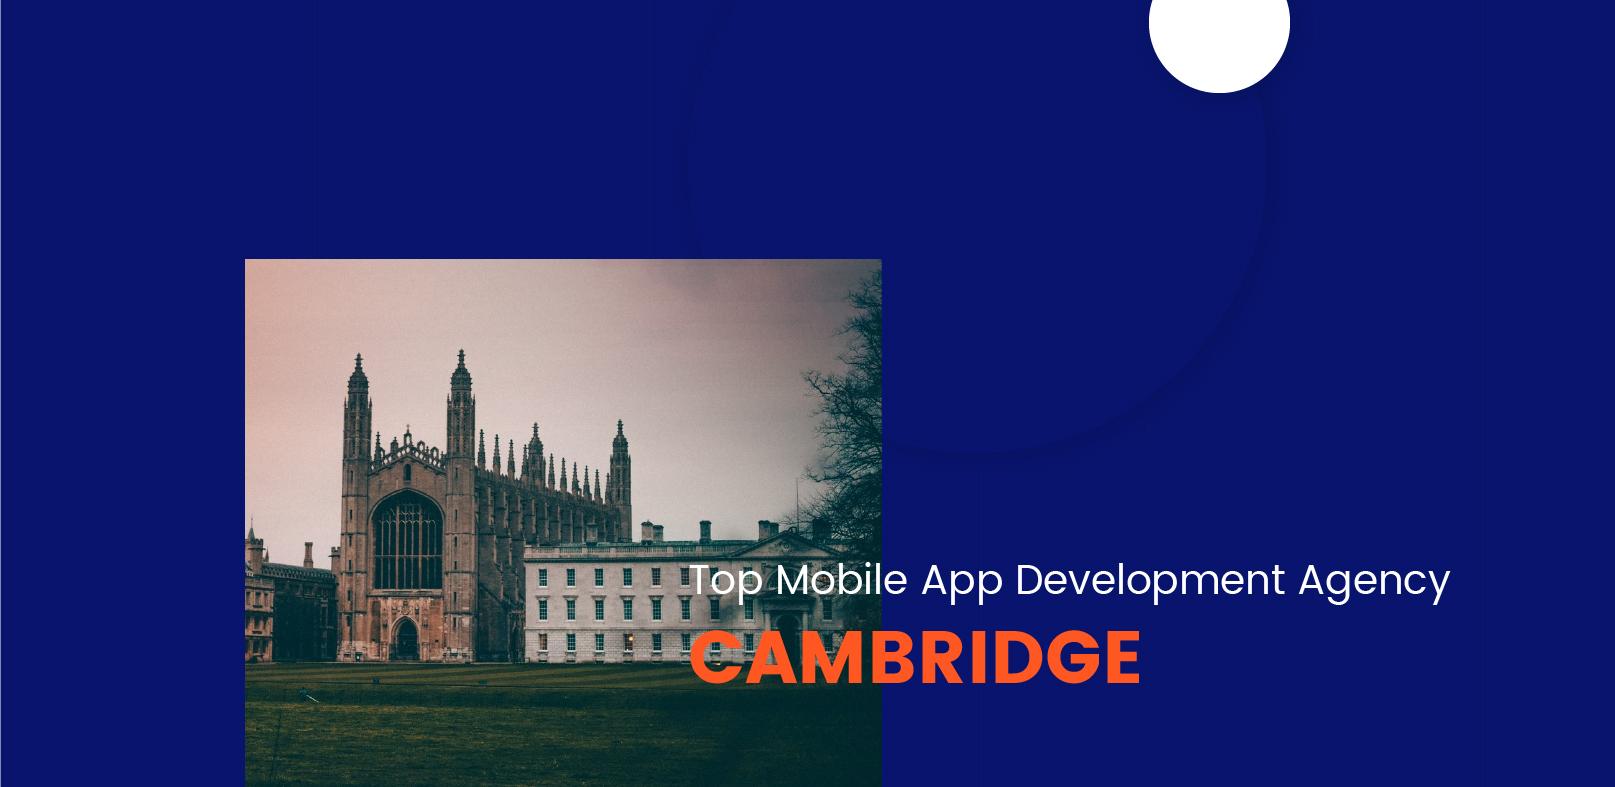 Best Mobile App Development Agency in Cambridge - WebClues Infotech